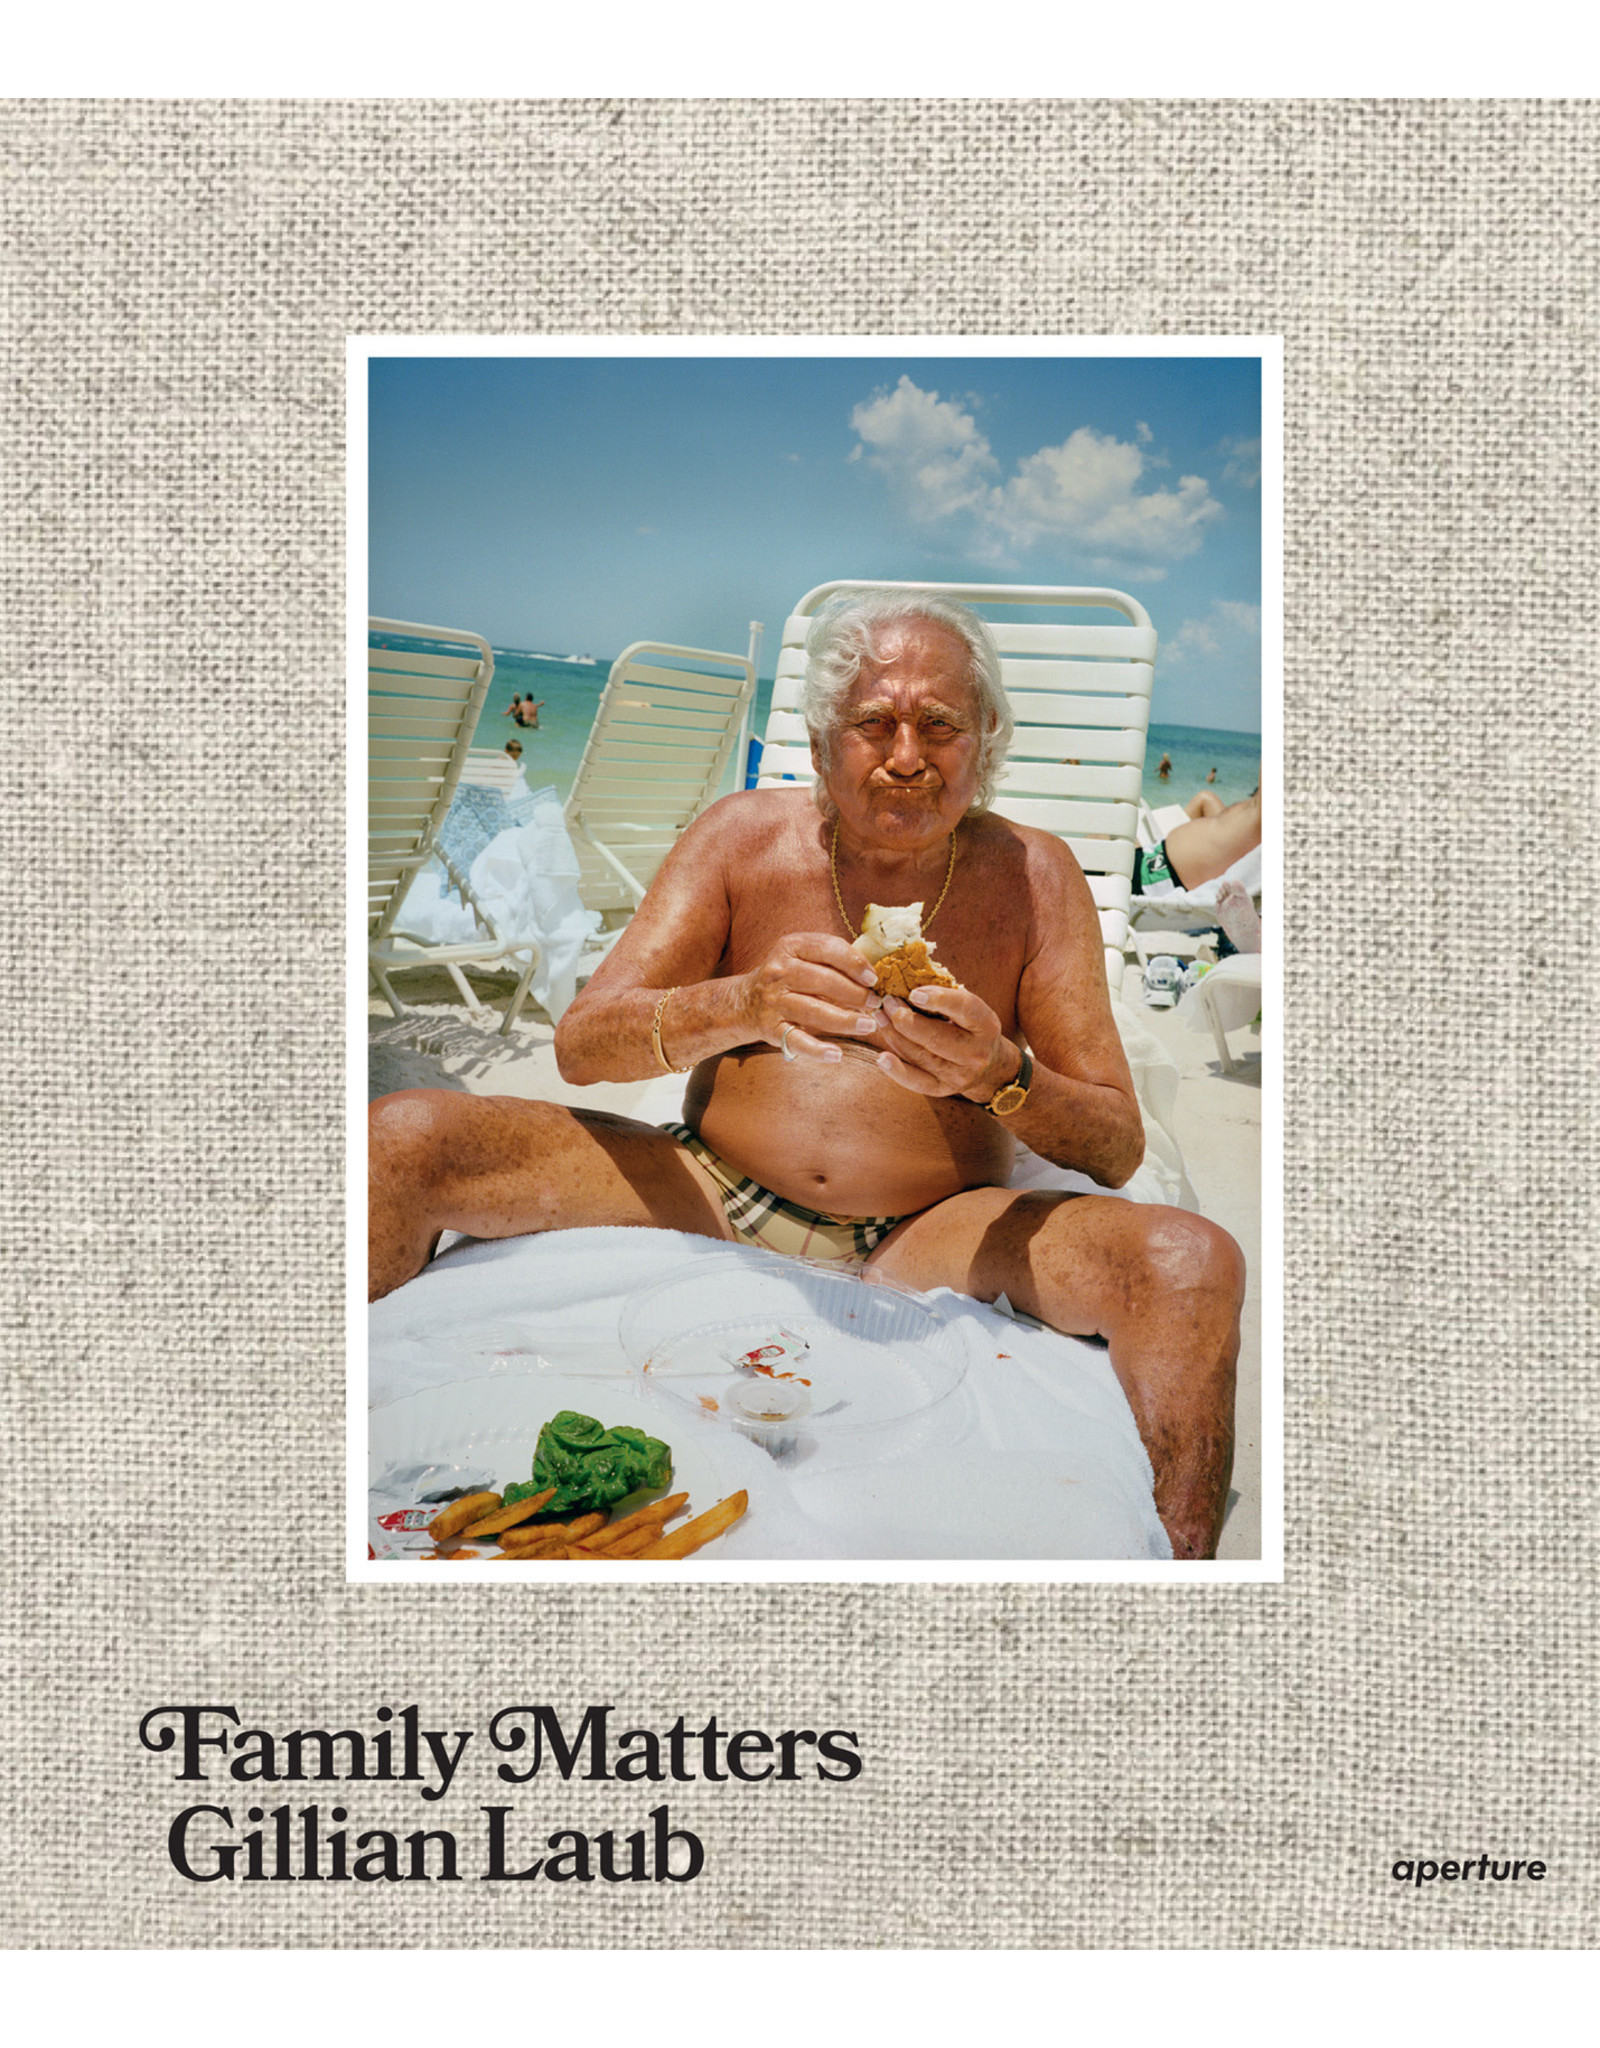 Gillian Laub: Family Matters